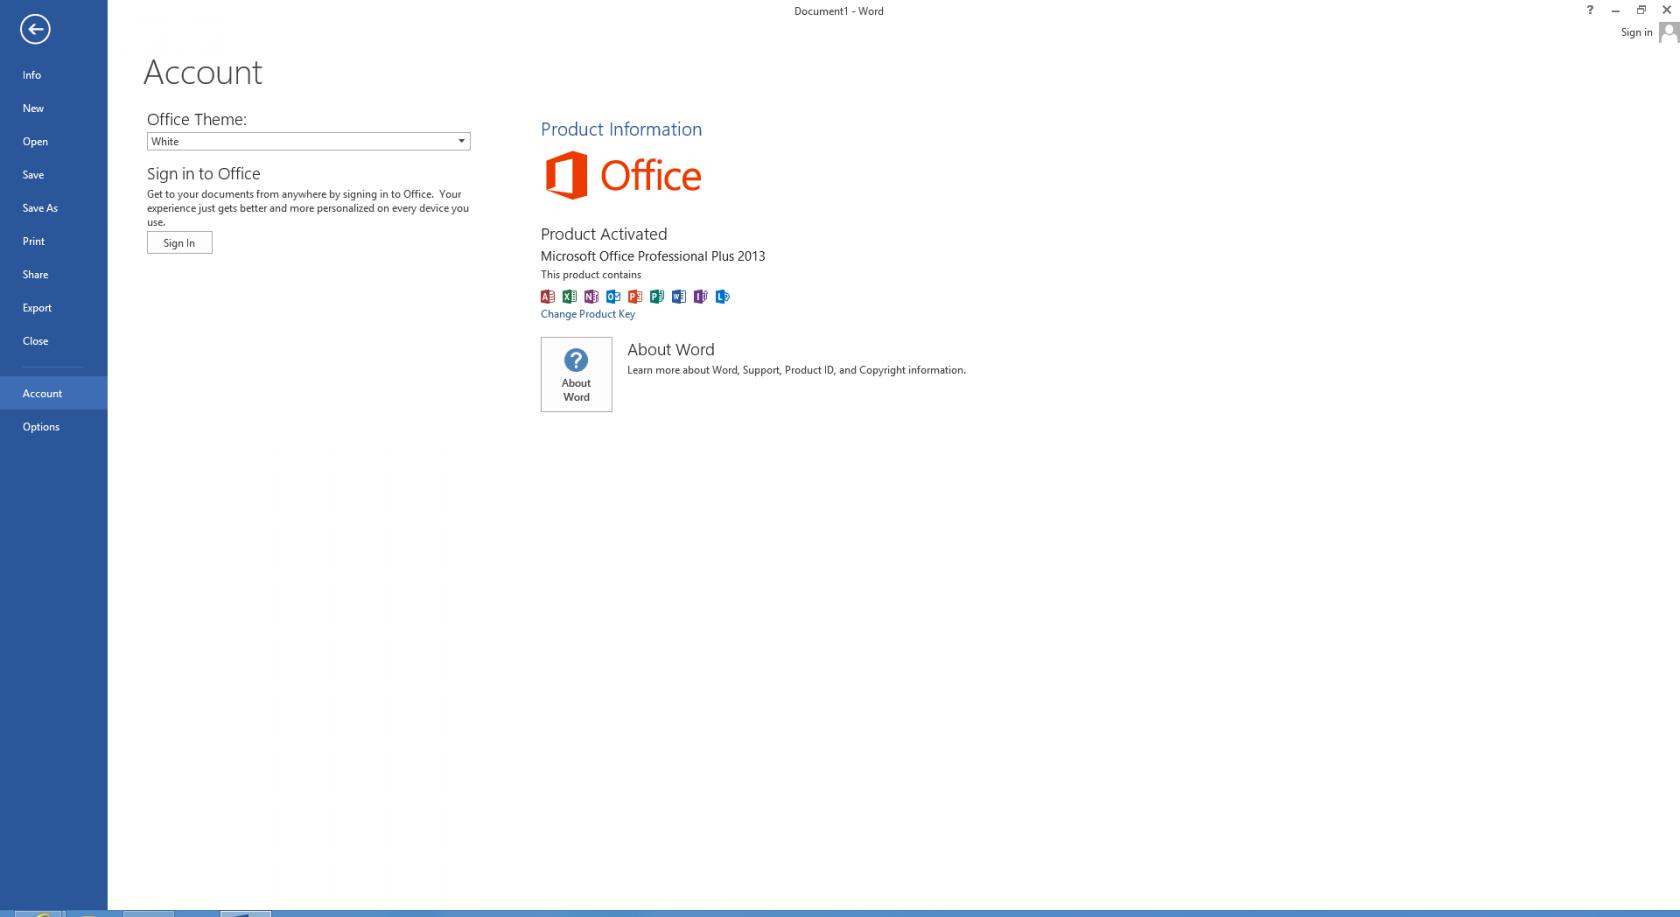 microsoft office professional 64 bit